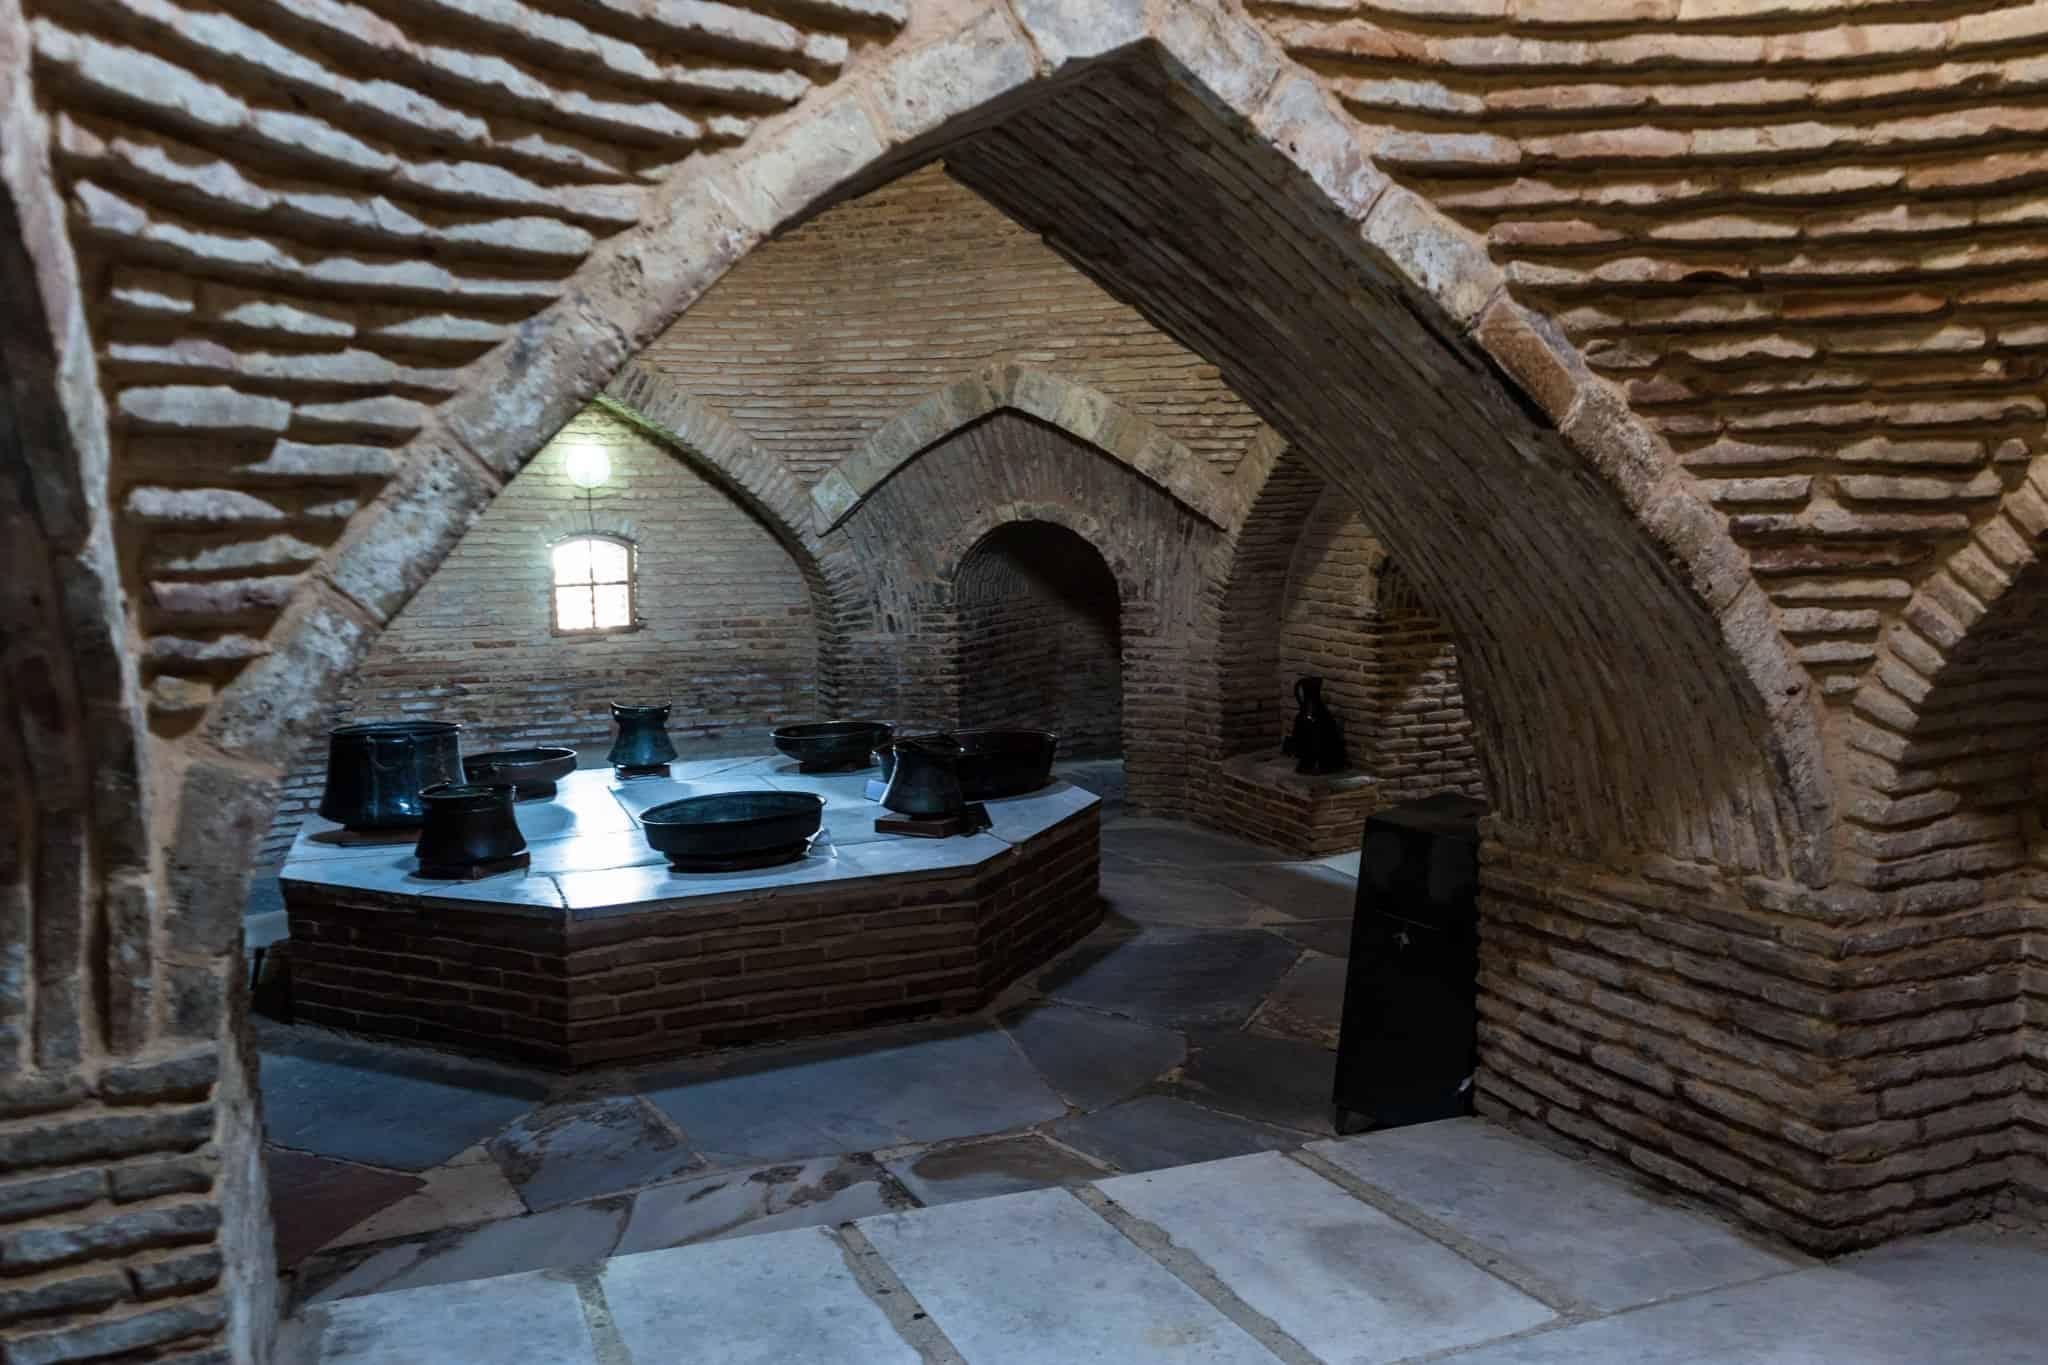 Underground Mosque the Mausoleum of Khawaja Ahmed Yasawi Turkistan